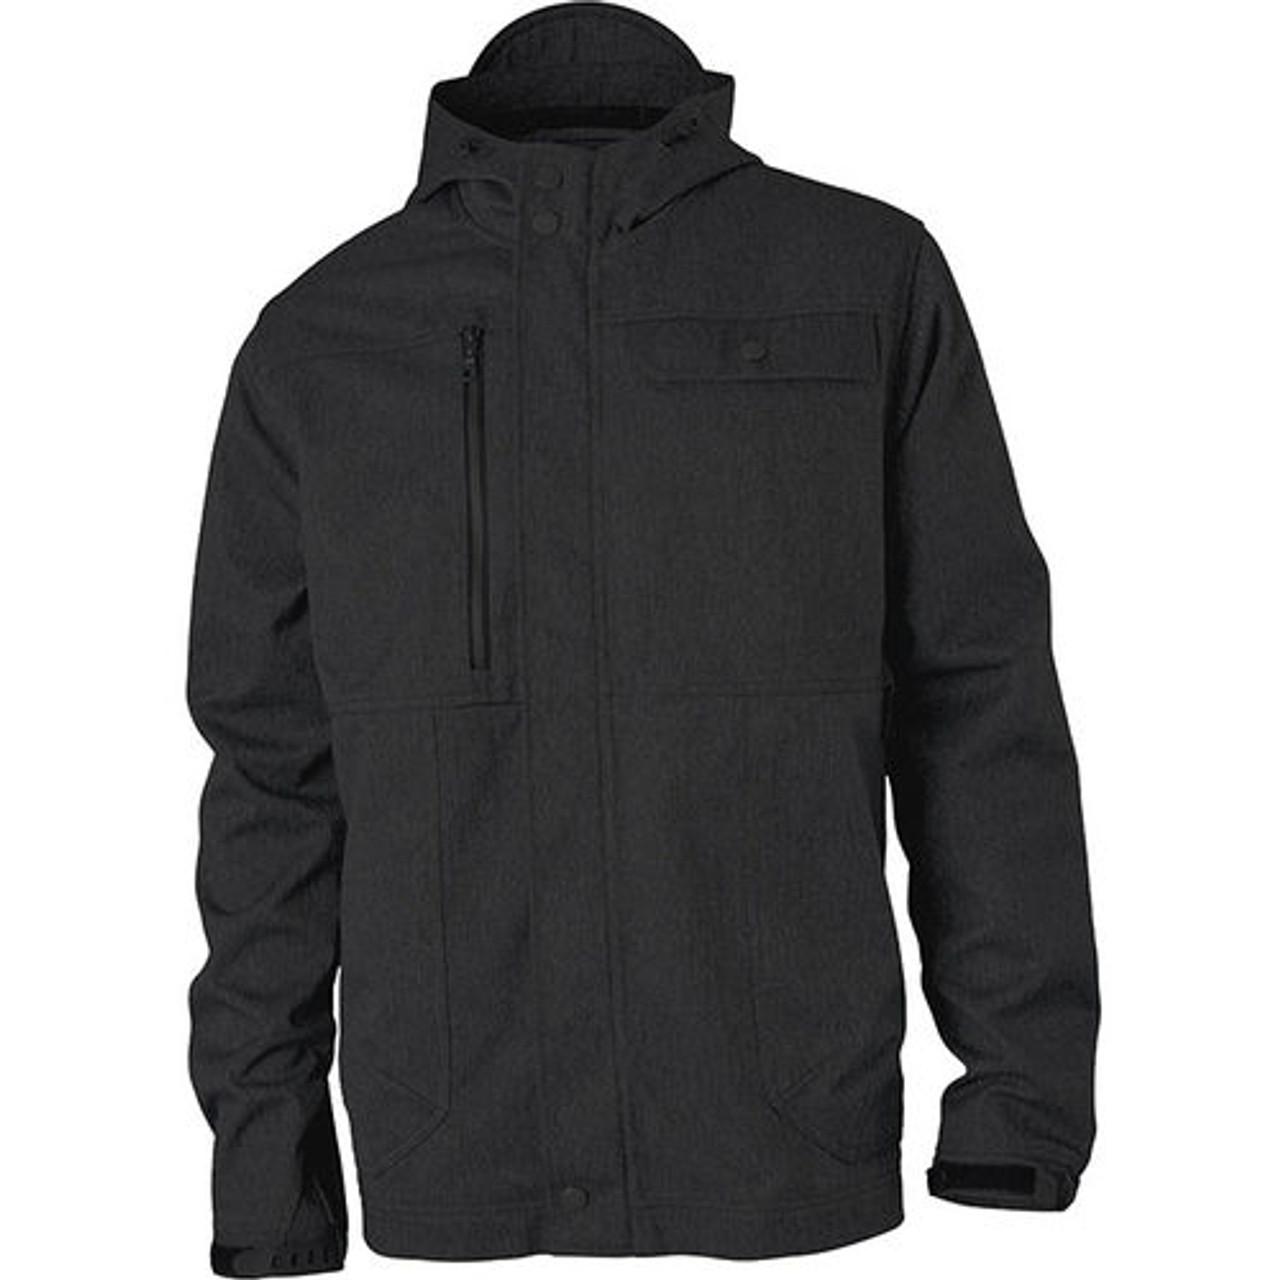 BLACKHAWK DERECHO JACKET, Waterproof, 4 multi-purpose document and gear storage pockets, adjustable 4-piece hood, JK05